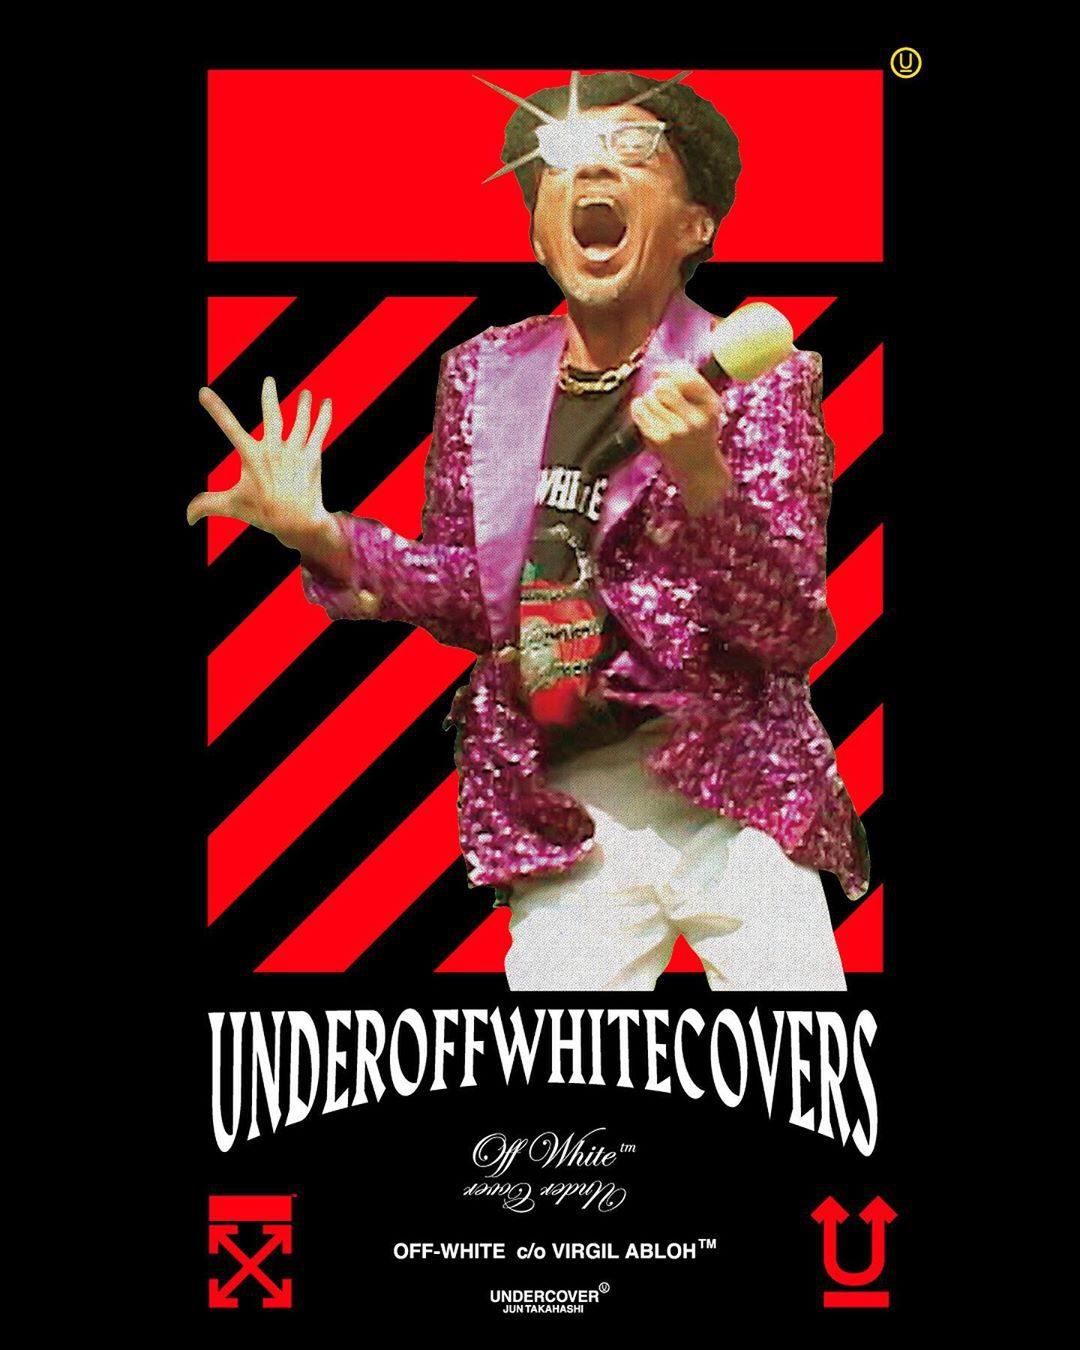 Undercover, Off-White